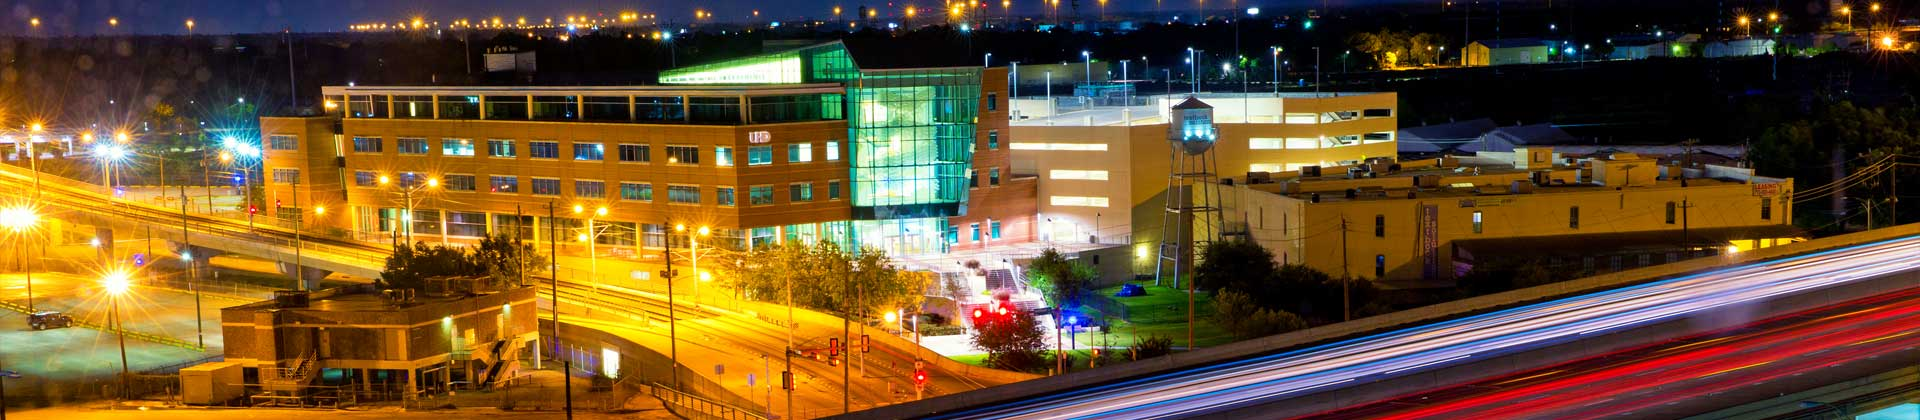 Illuminated Shea building at night